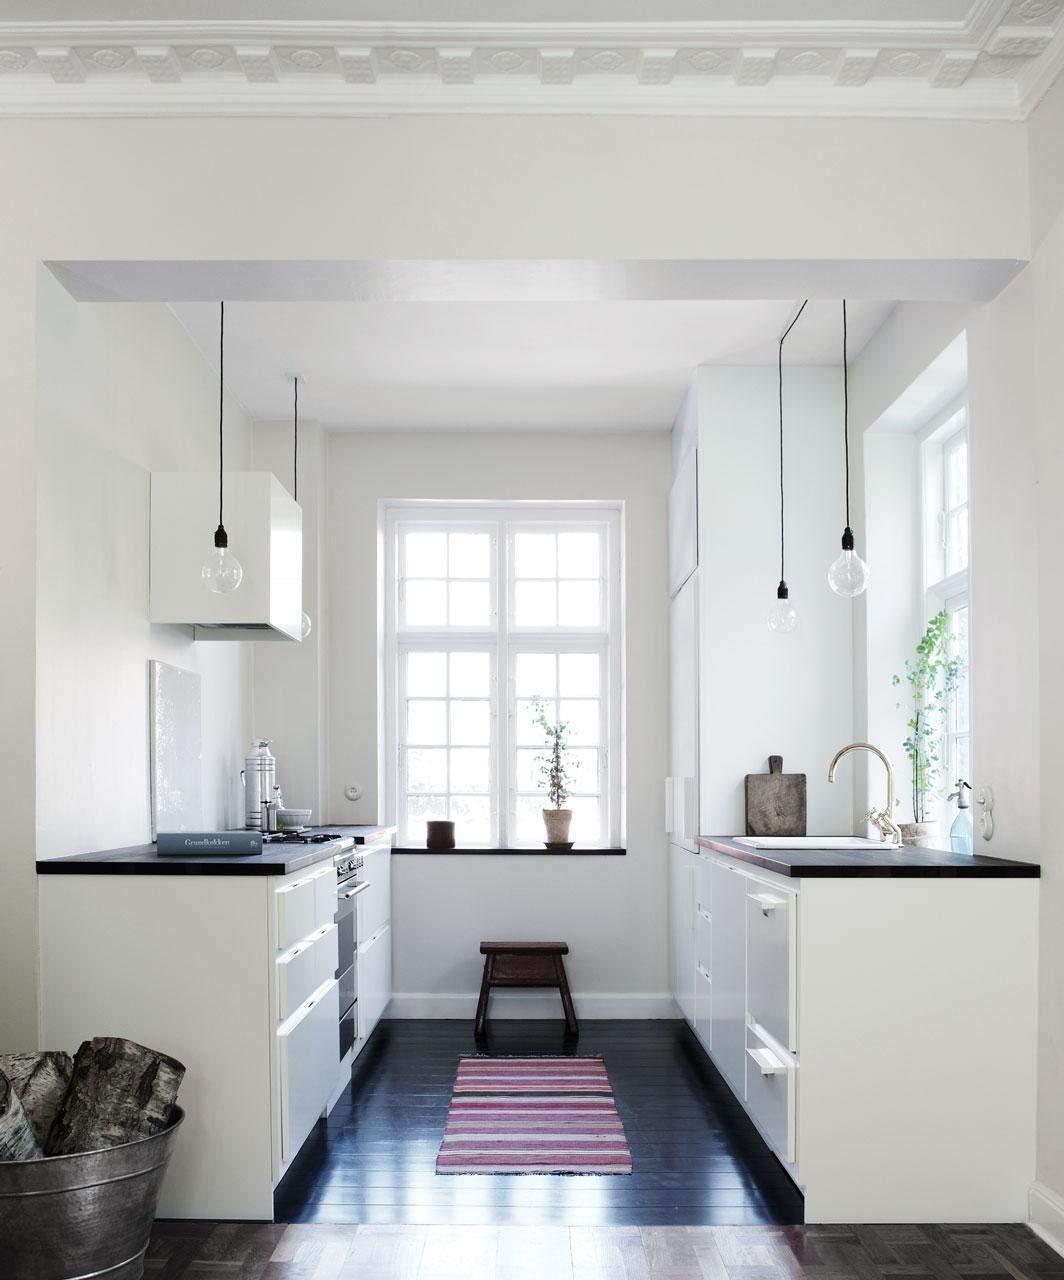 Інтер'єр паралельної кухні